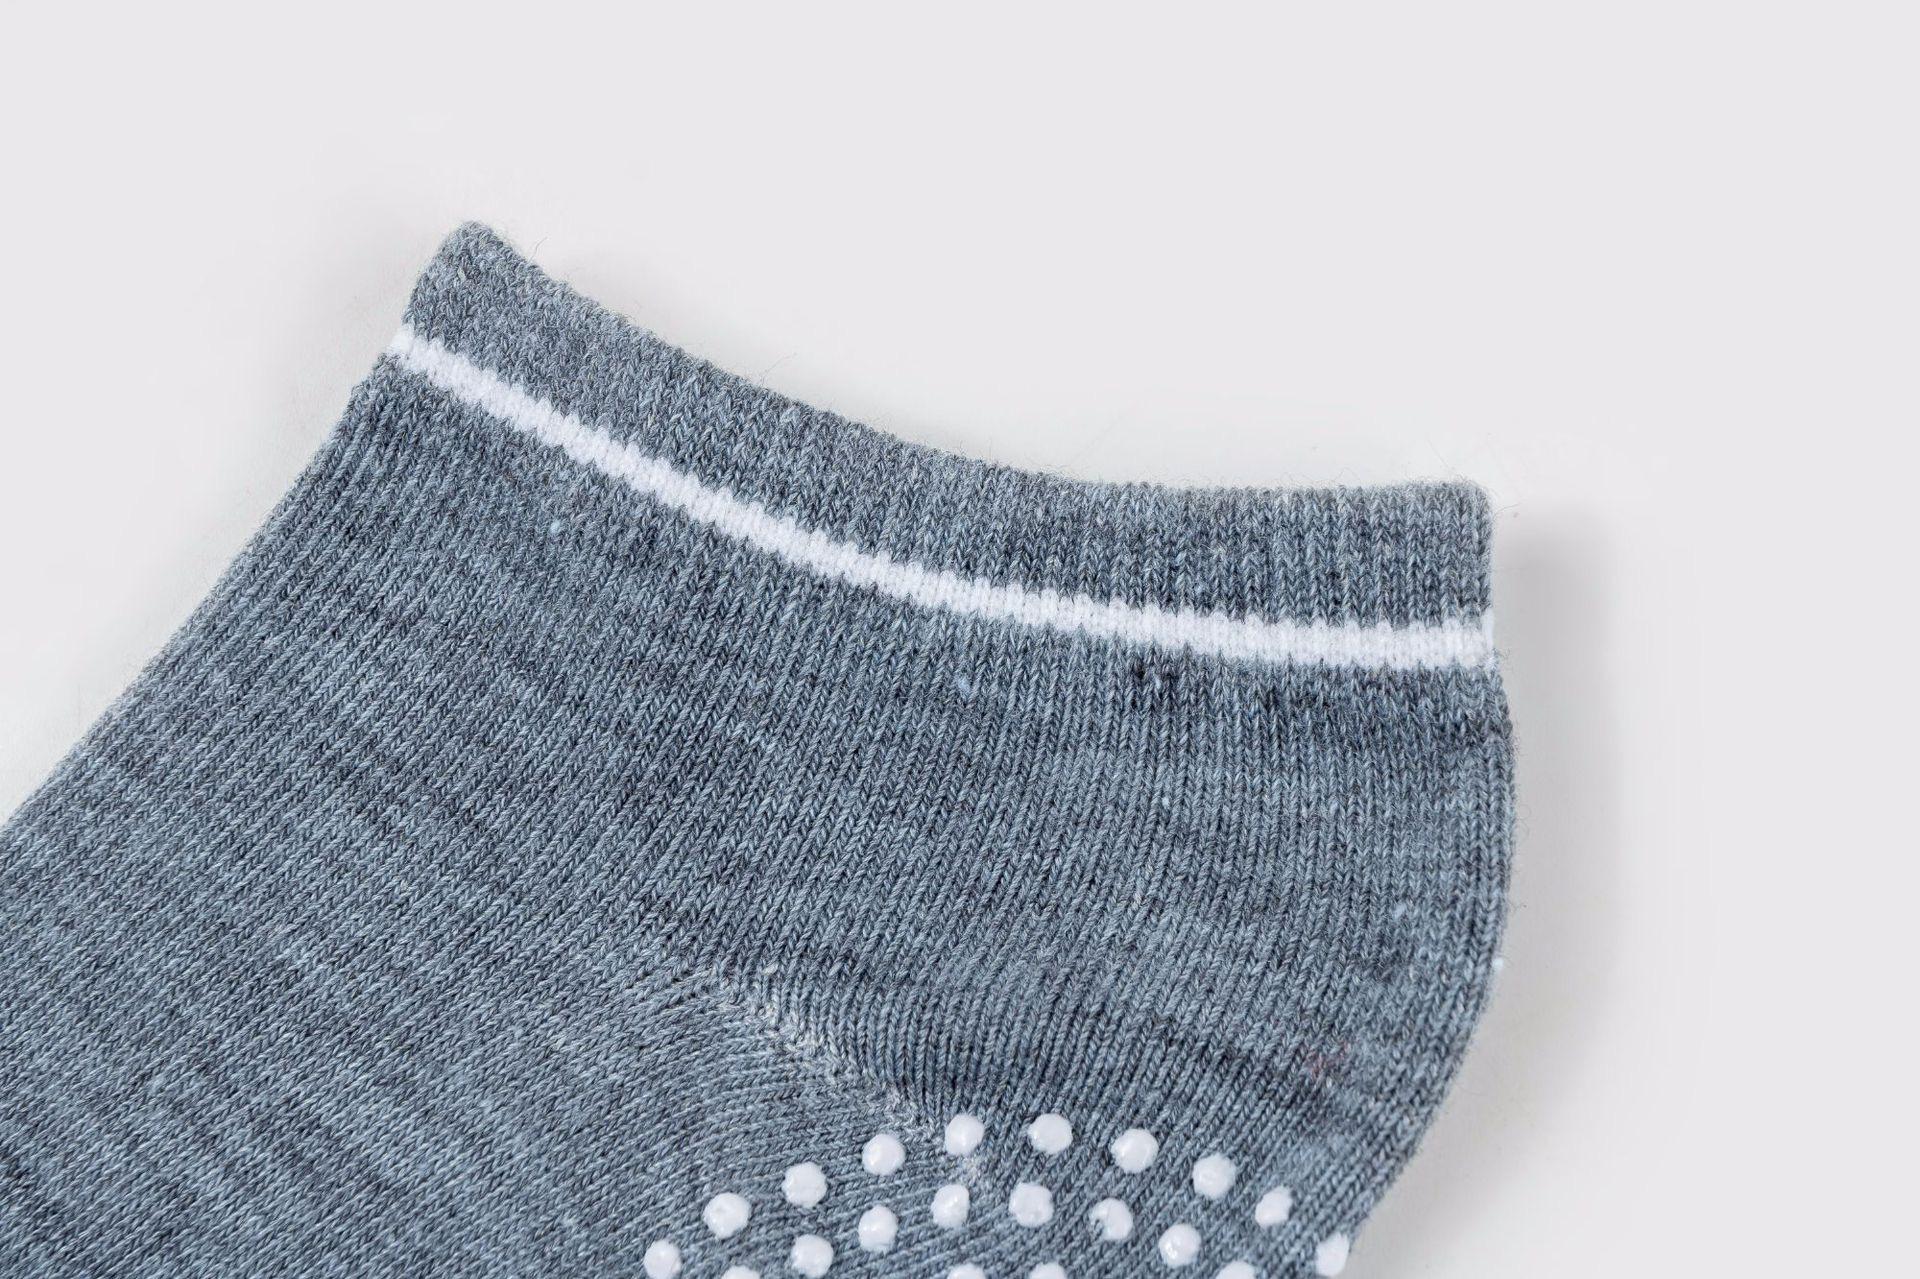 Non Slip OEM Custom Design Pilates Anti Slip Grip Socks Yoga Socks with Grip